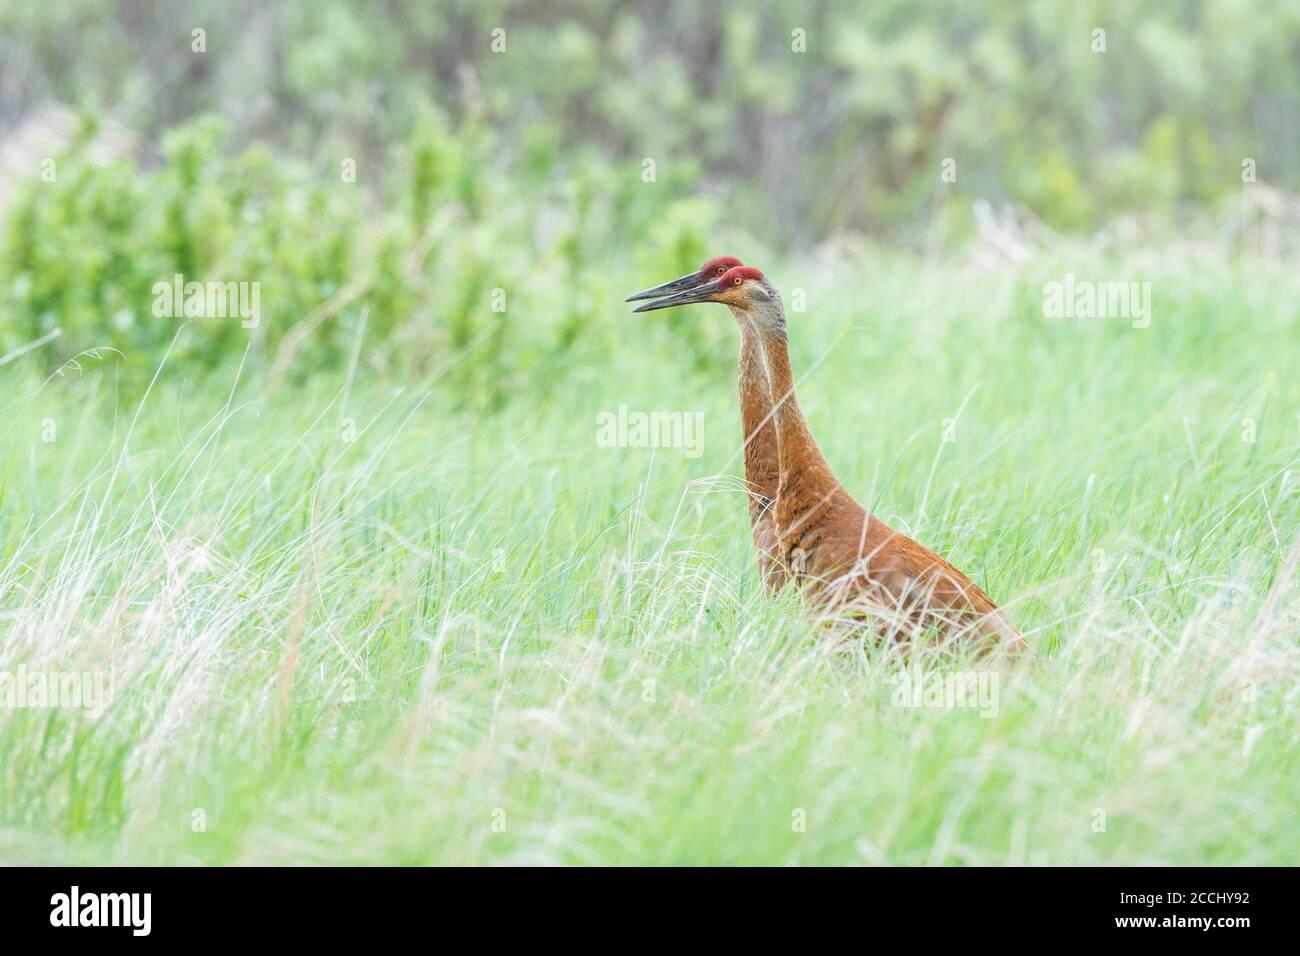 Pair of Sandhill Cranes feeding in wetland, Eastern North America, by Dominique Braud/Dembinsky Photo Assoc Stock Photo